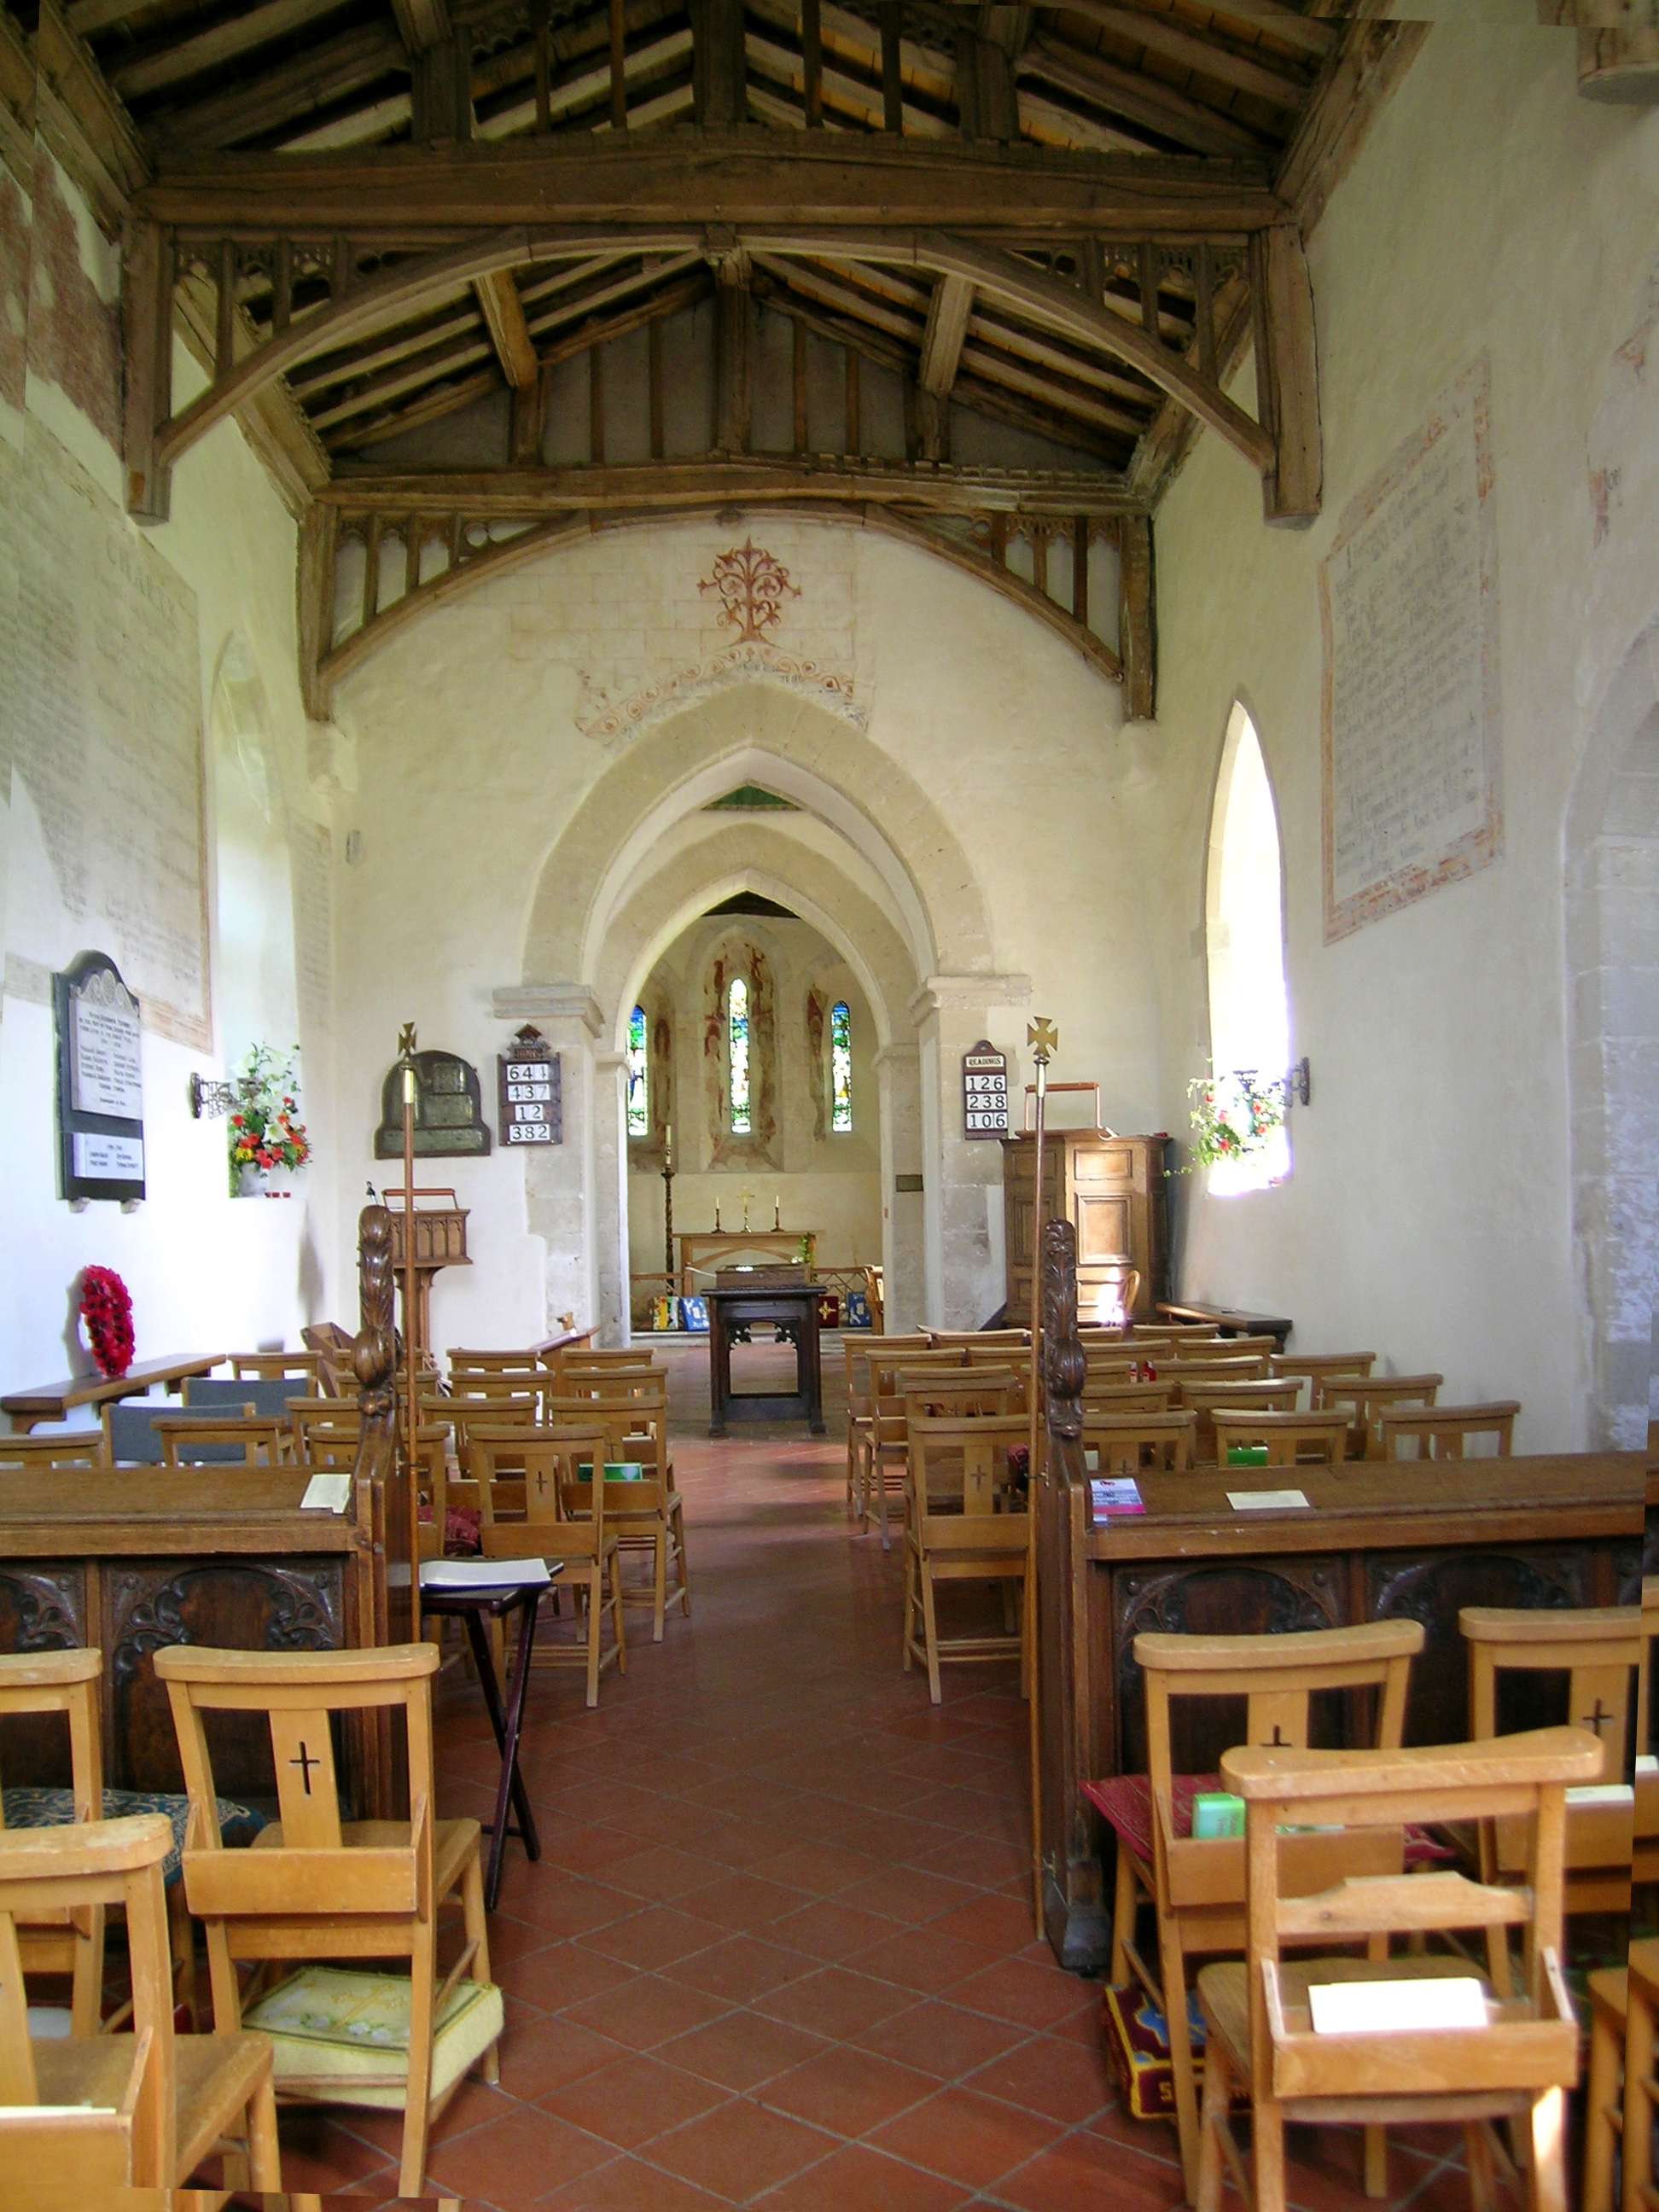 FileSt Marys Church Radnage Bucks England Interiorjpg